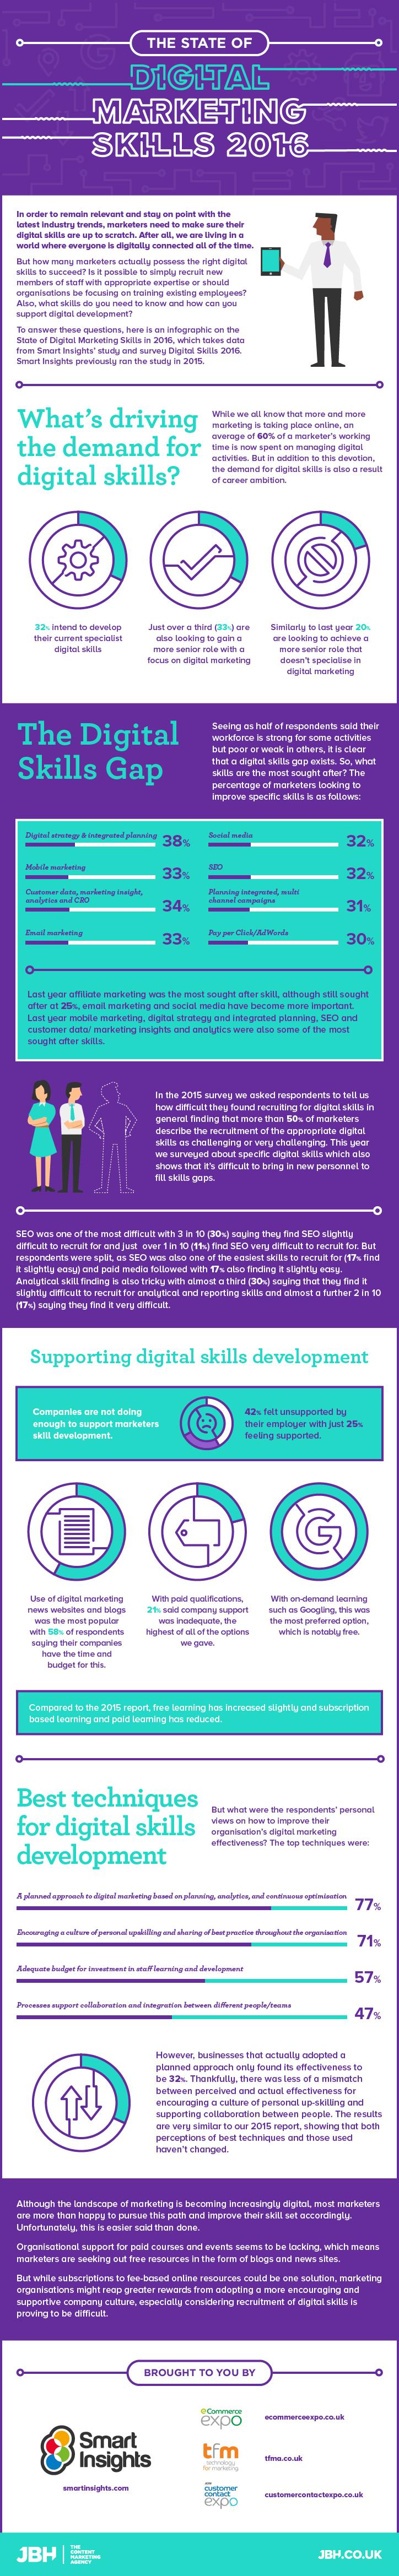 digital-skills-infographic-state-of-digital-marketing-skills-2016